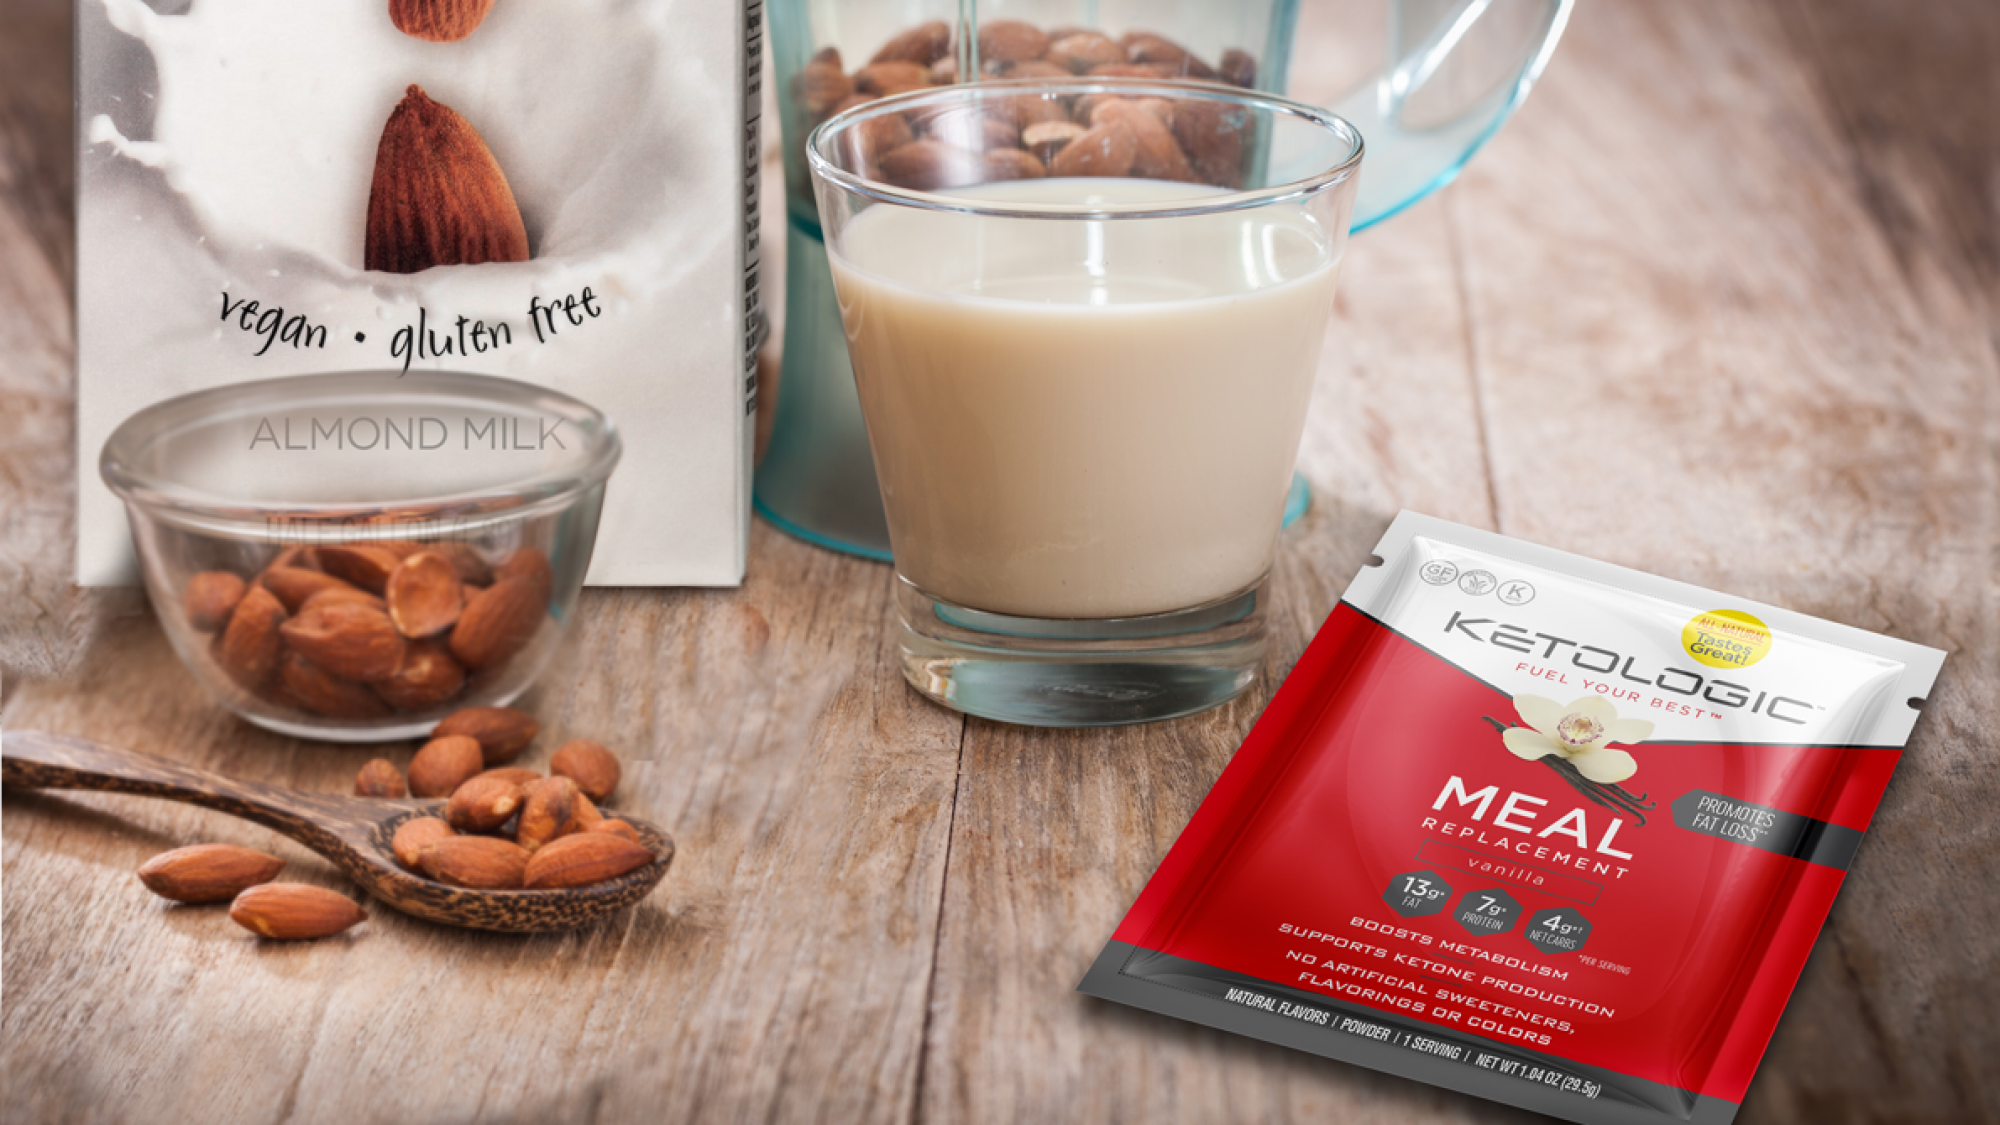 almond milk sauce for keto diet